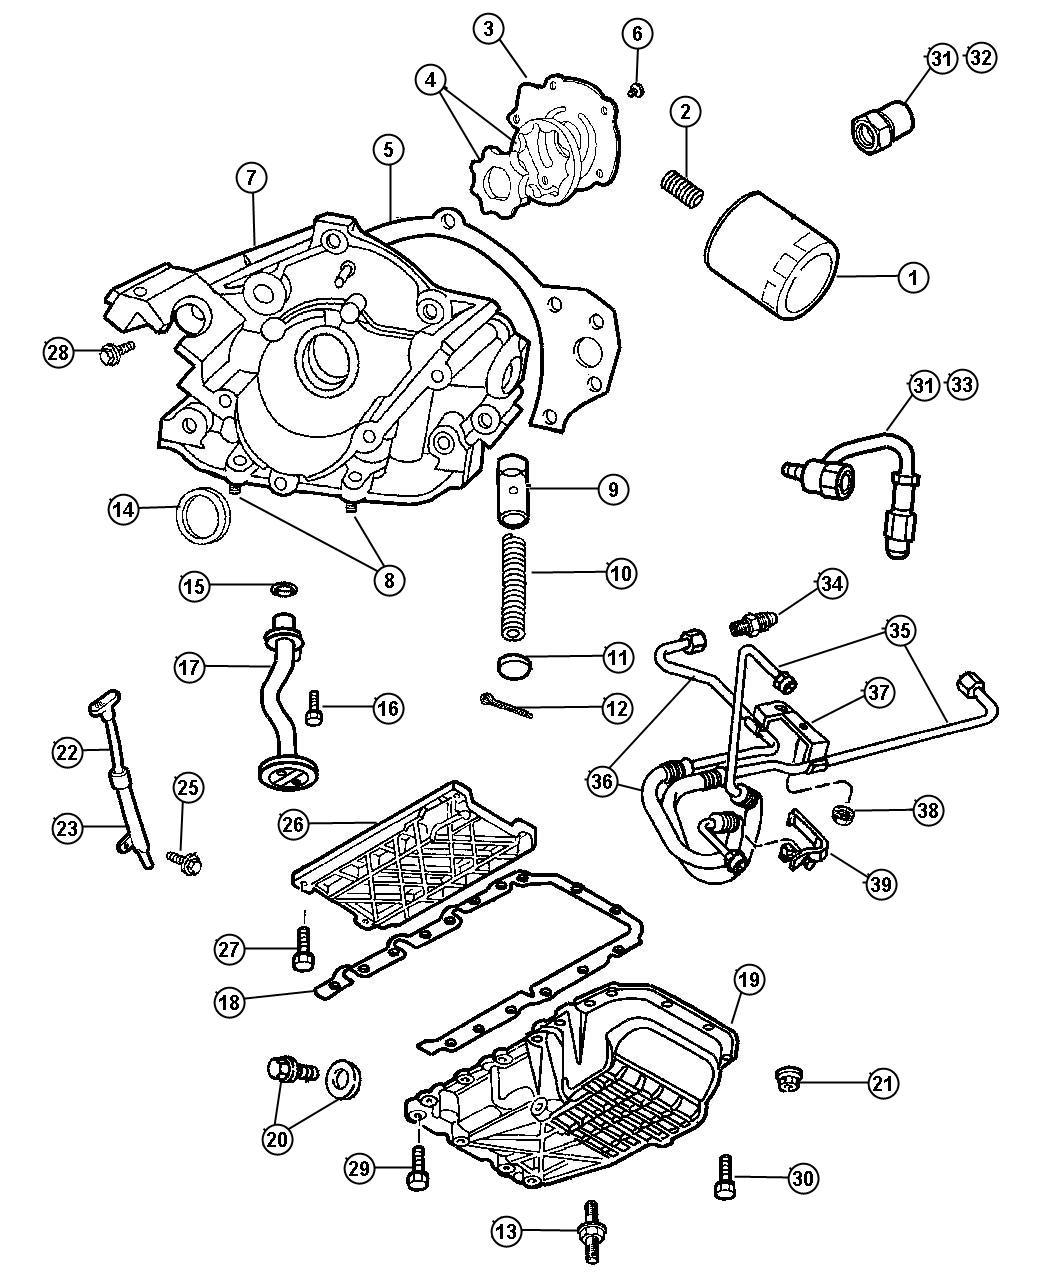 wiring diagram 1998 dodge stratus engine html